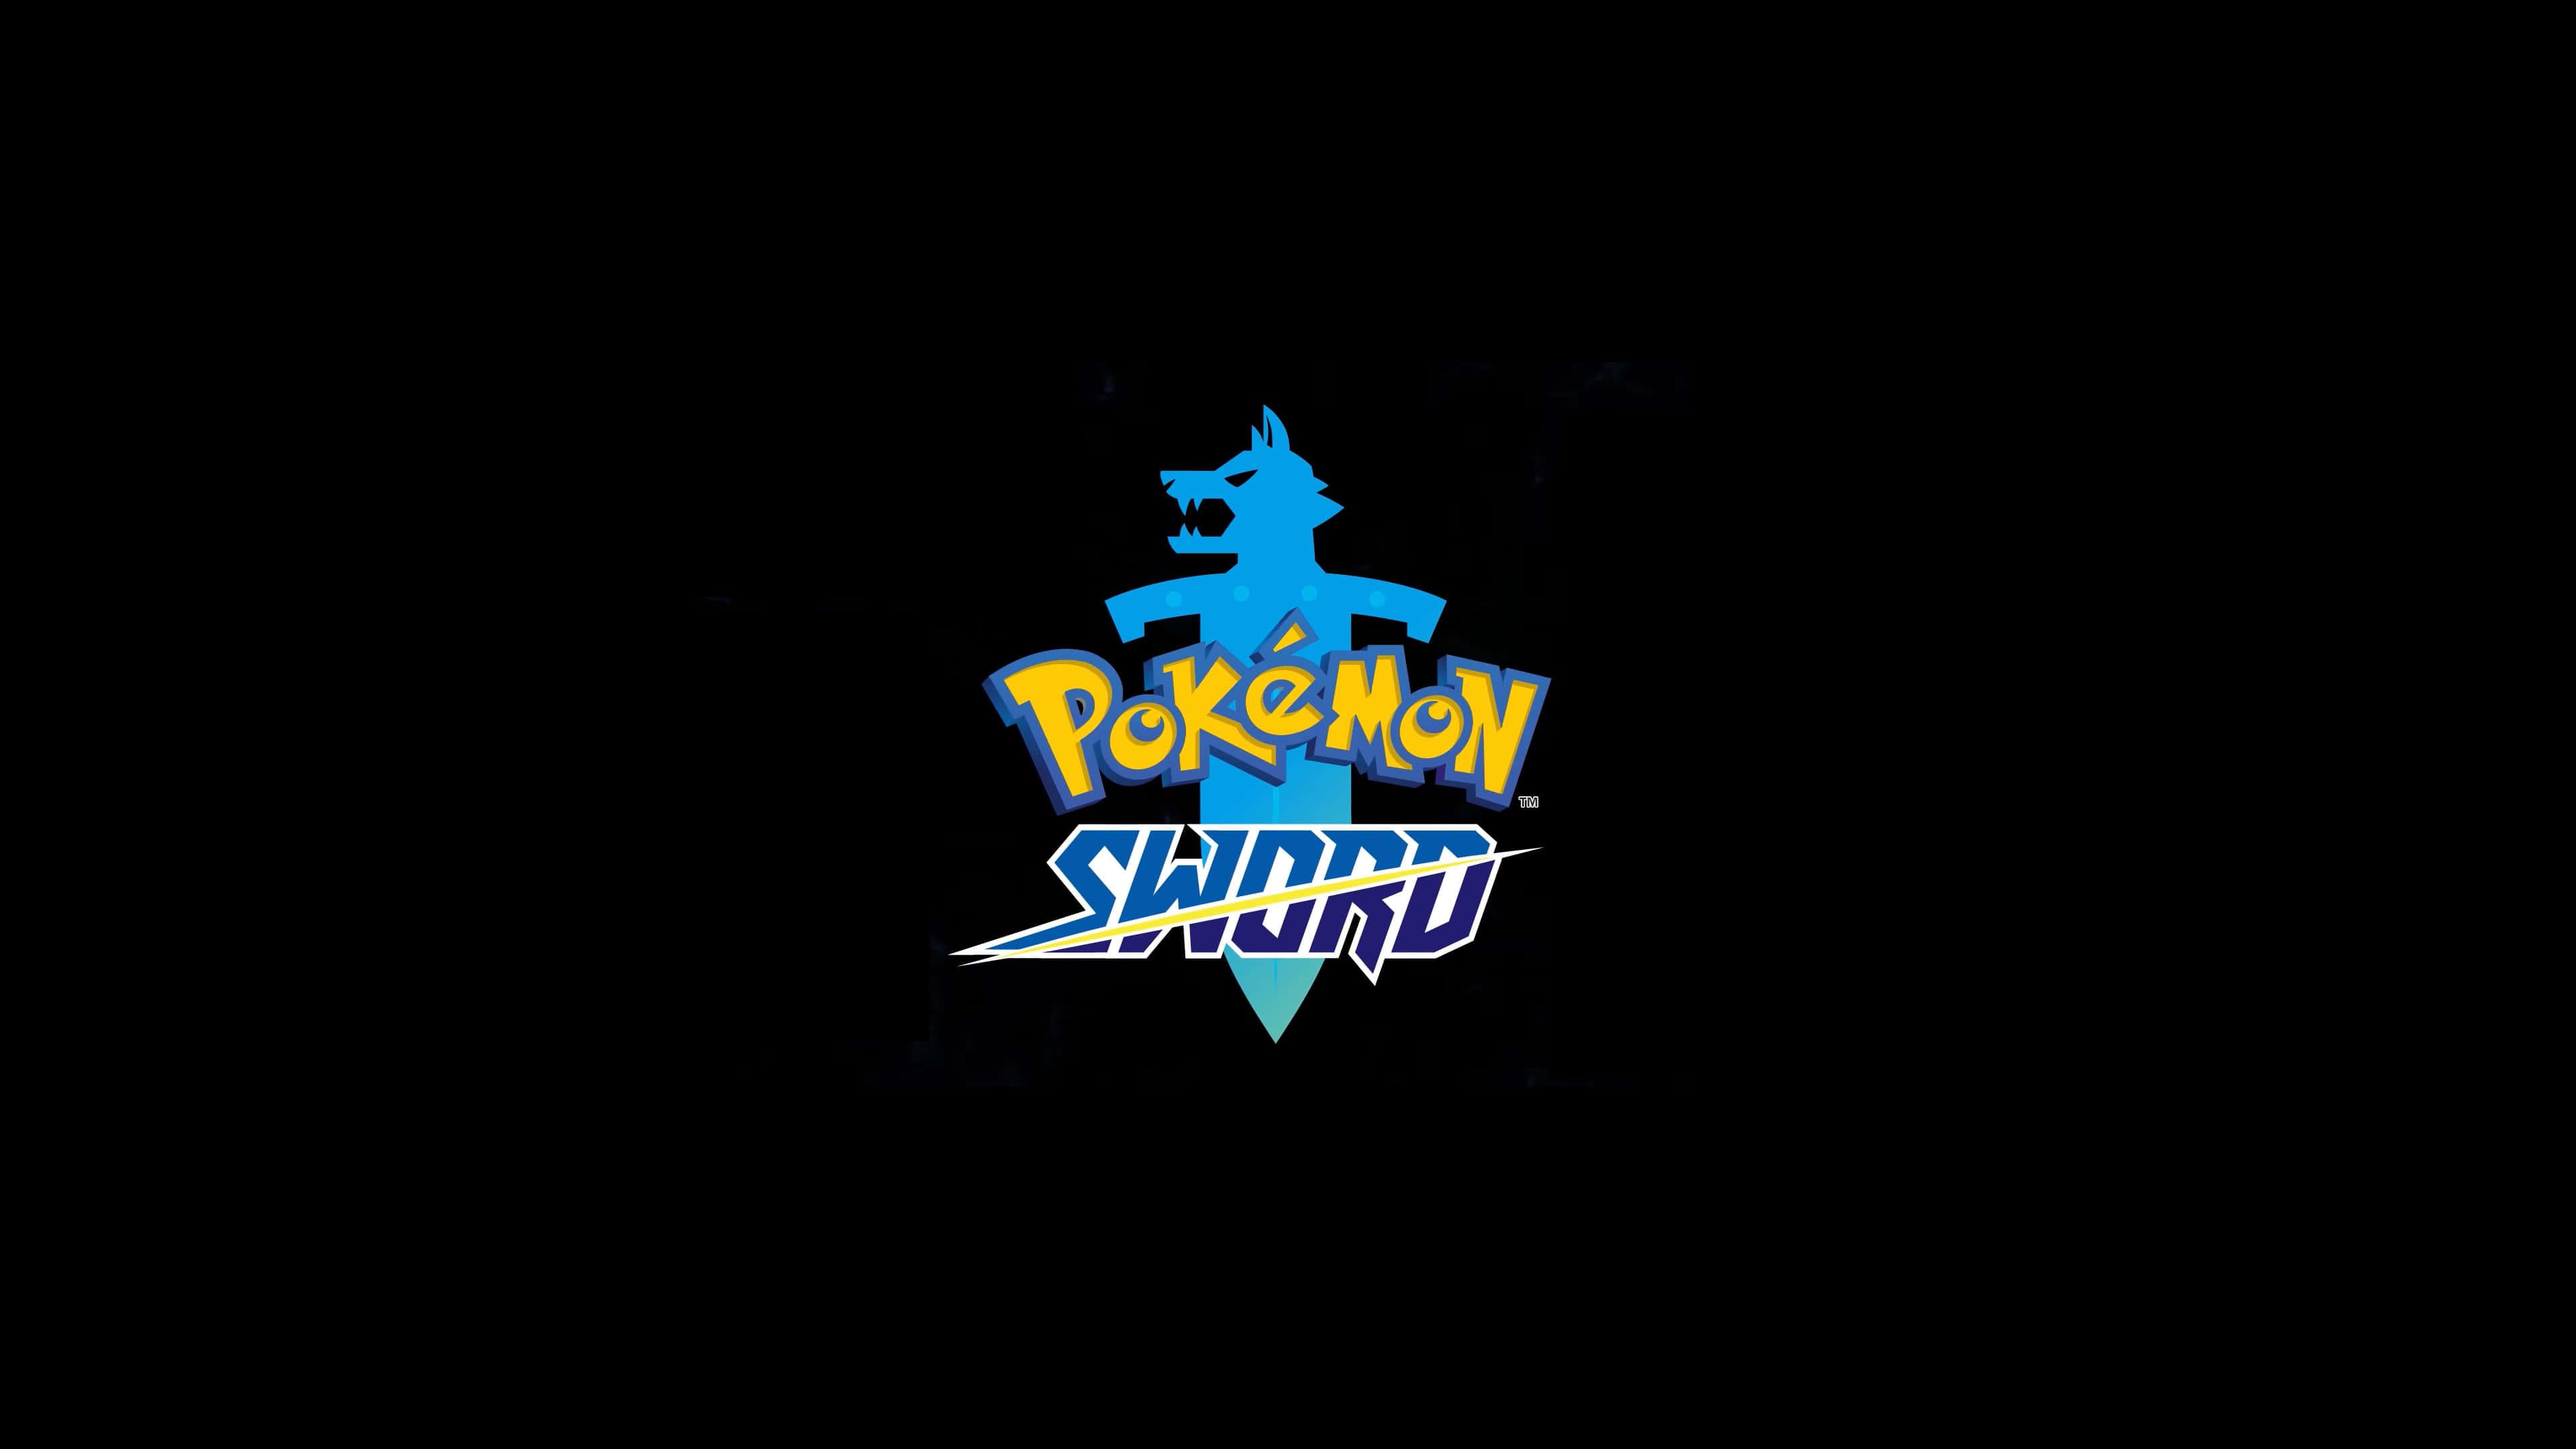 pokemon sword logo uhd 4k wallpaper